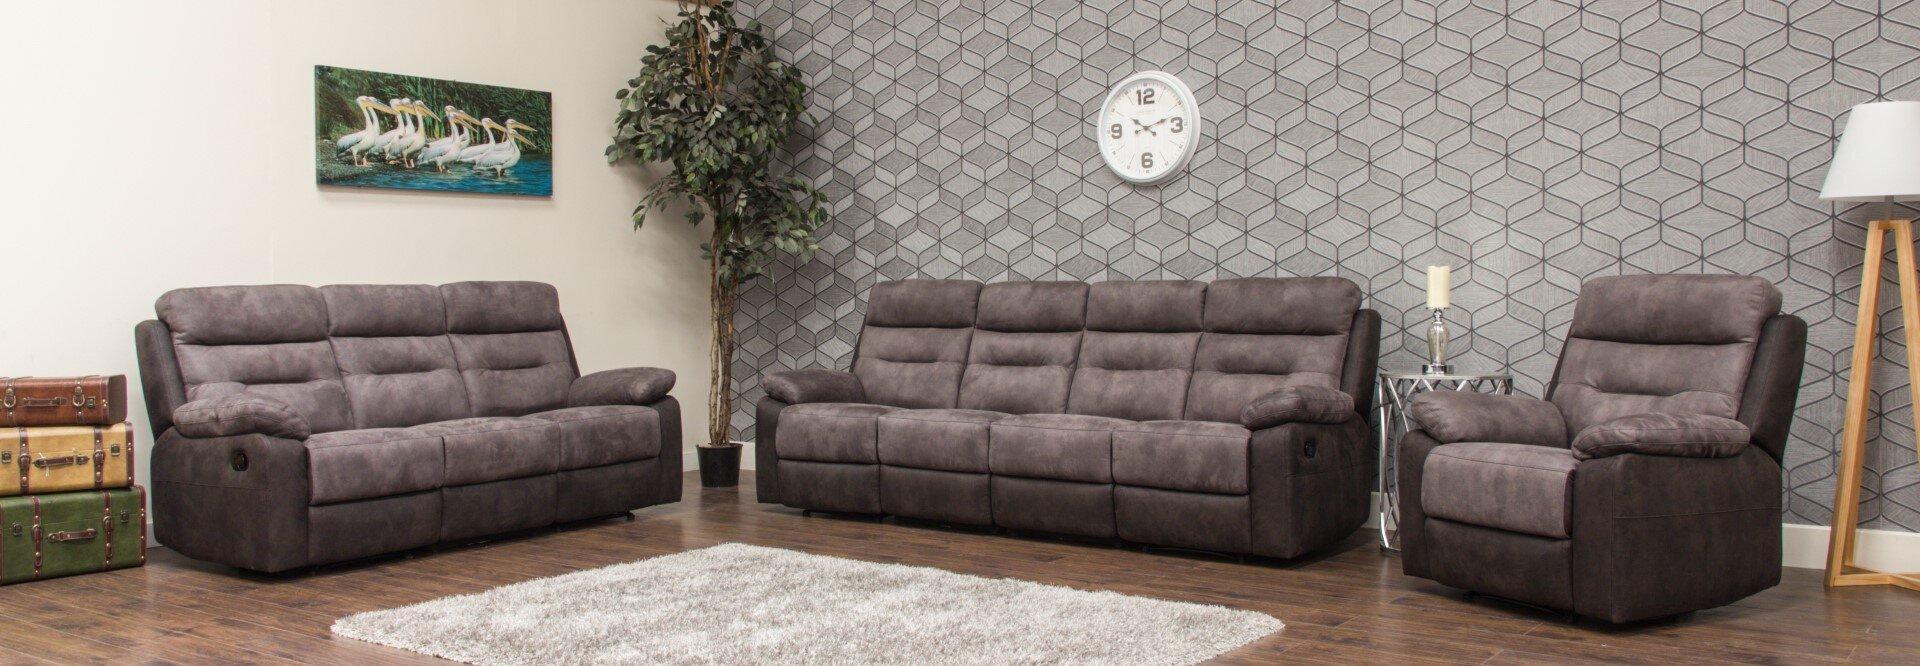 dillon fabric modular sofa charcoal 4